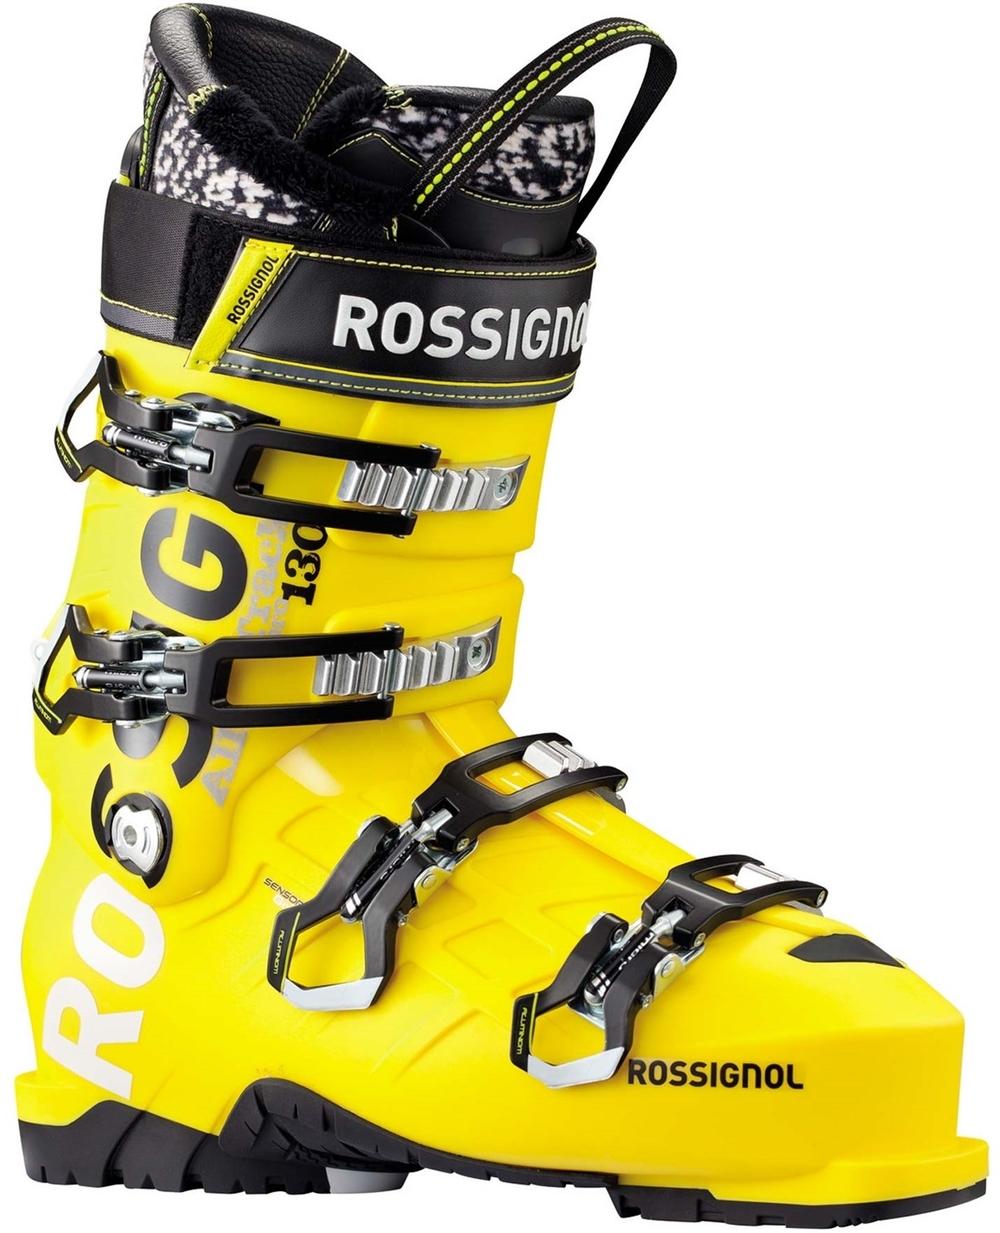 Rossignol Alltrack Pro 130 WTR Ski Boots, $850